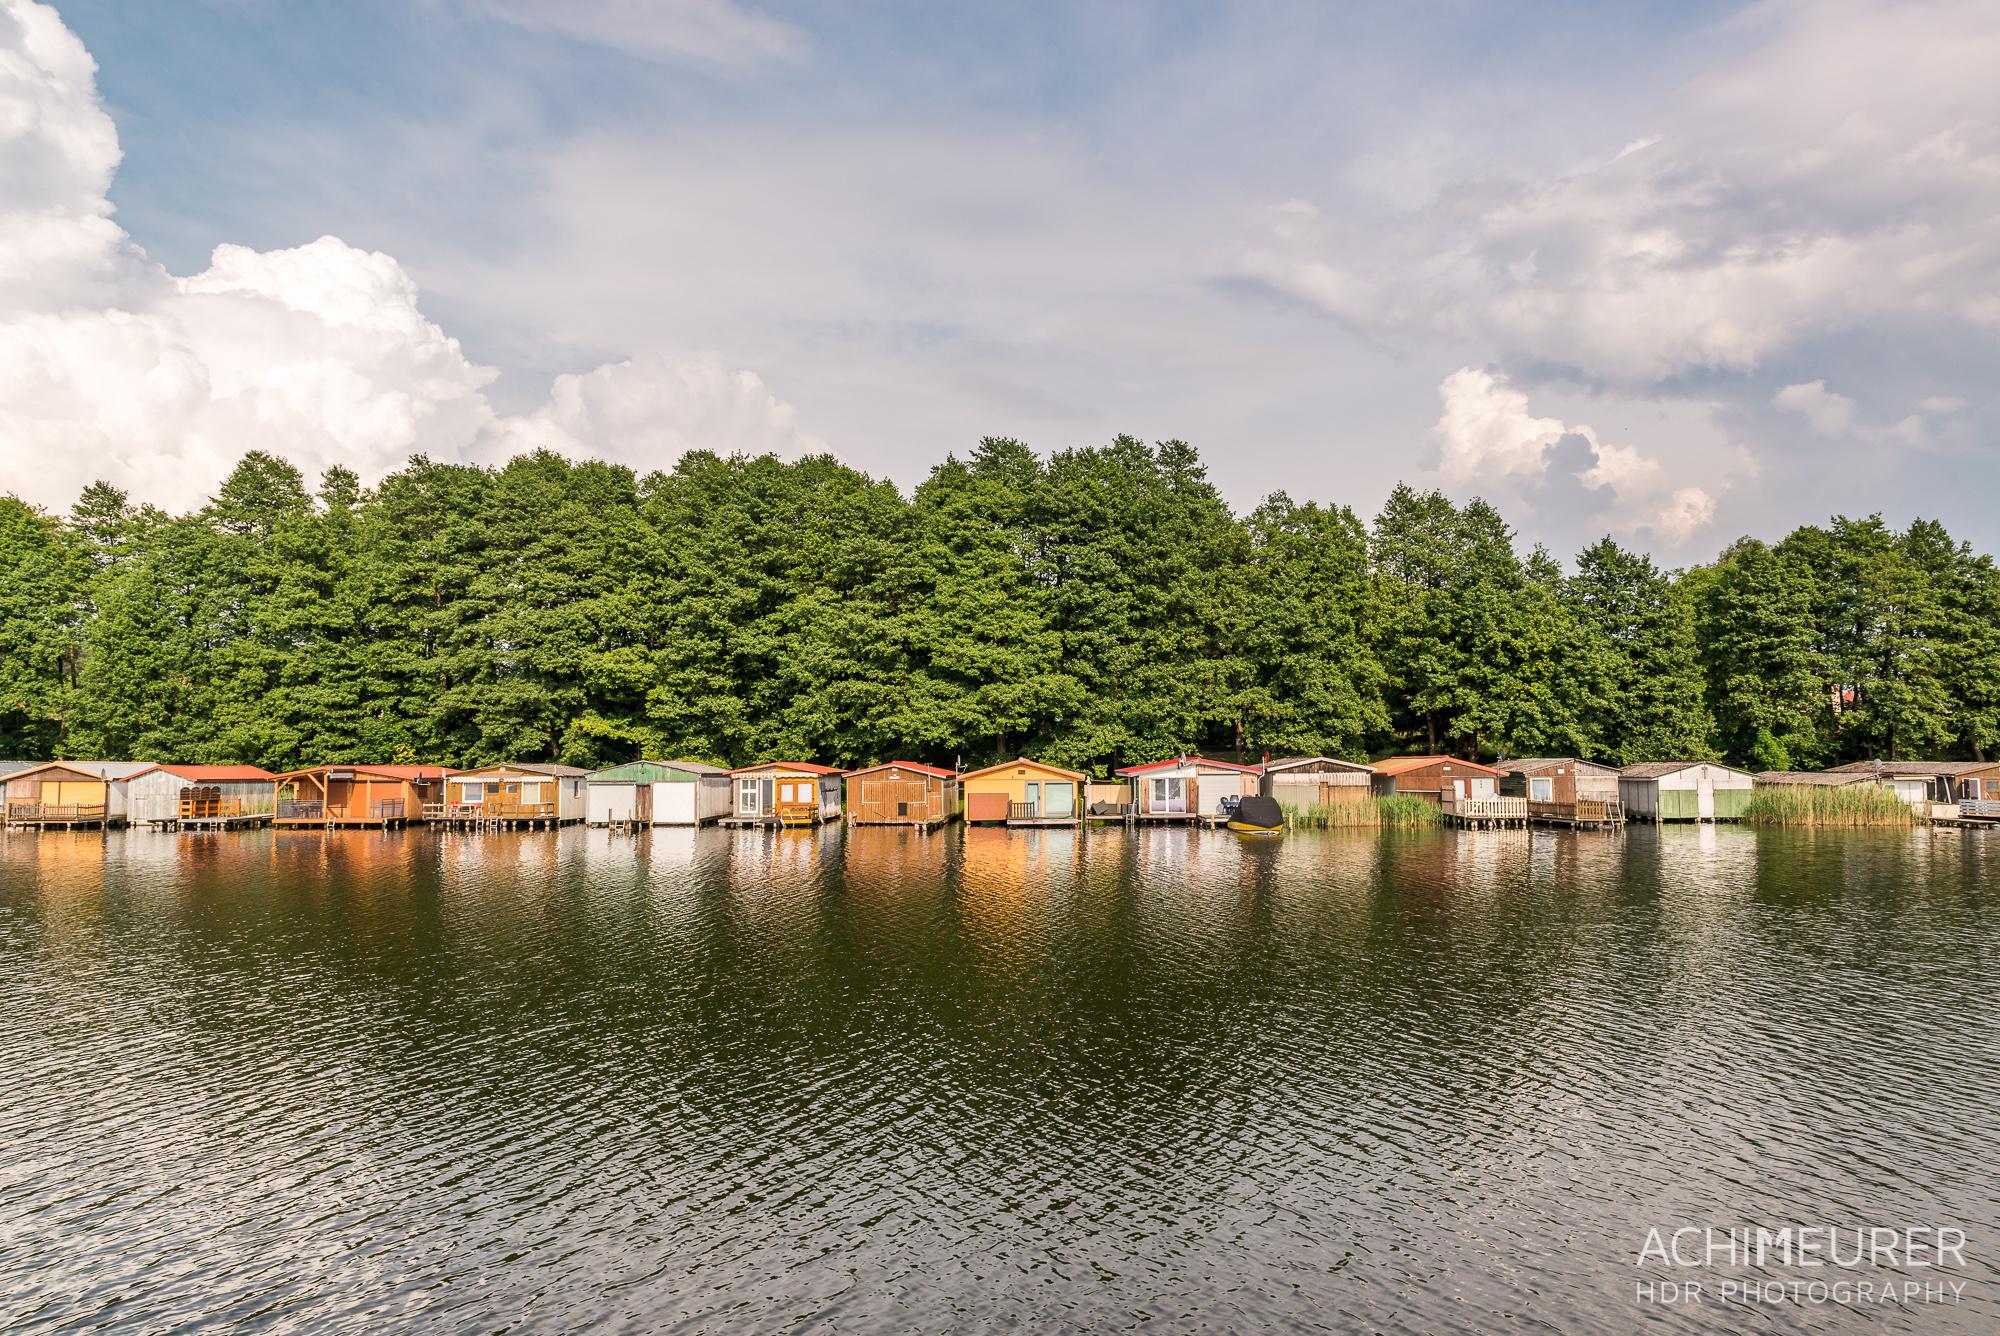 Hausboot-Kuhnle-Mueritz-Mecklenburg-Vorpommern-See_2638